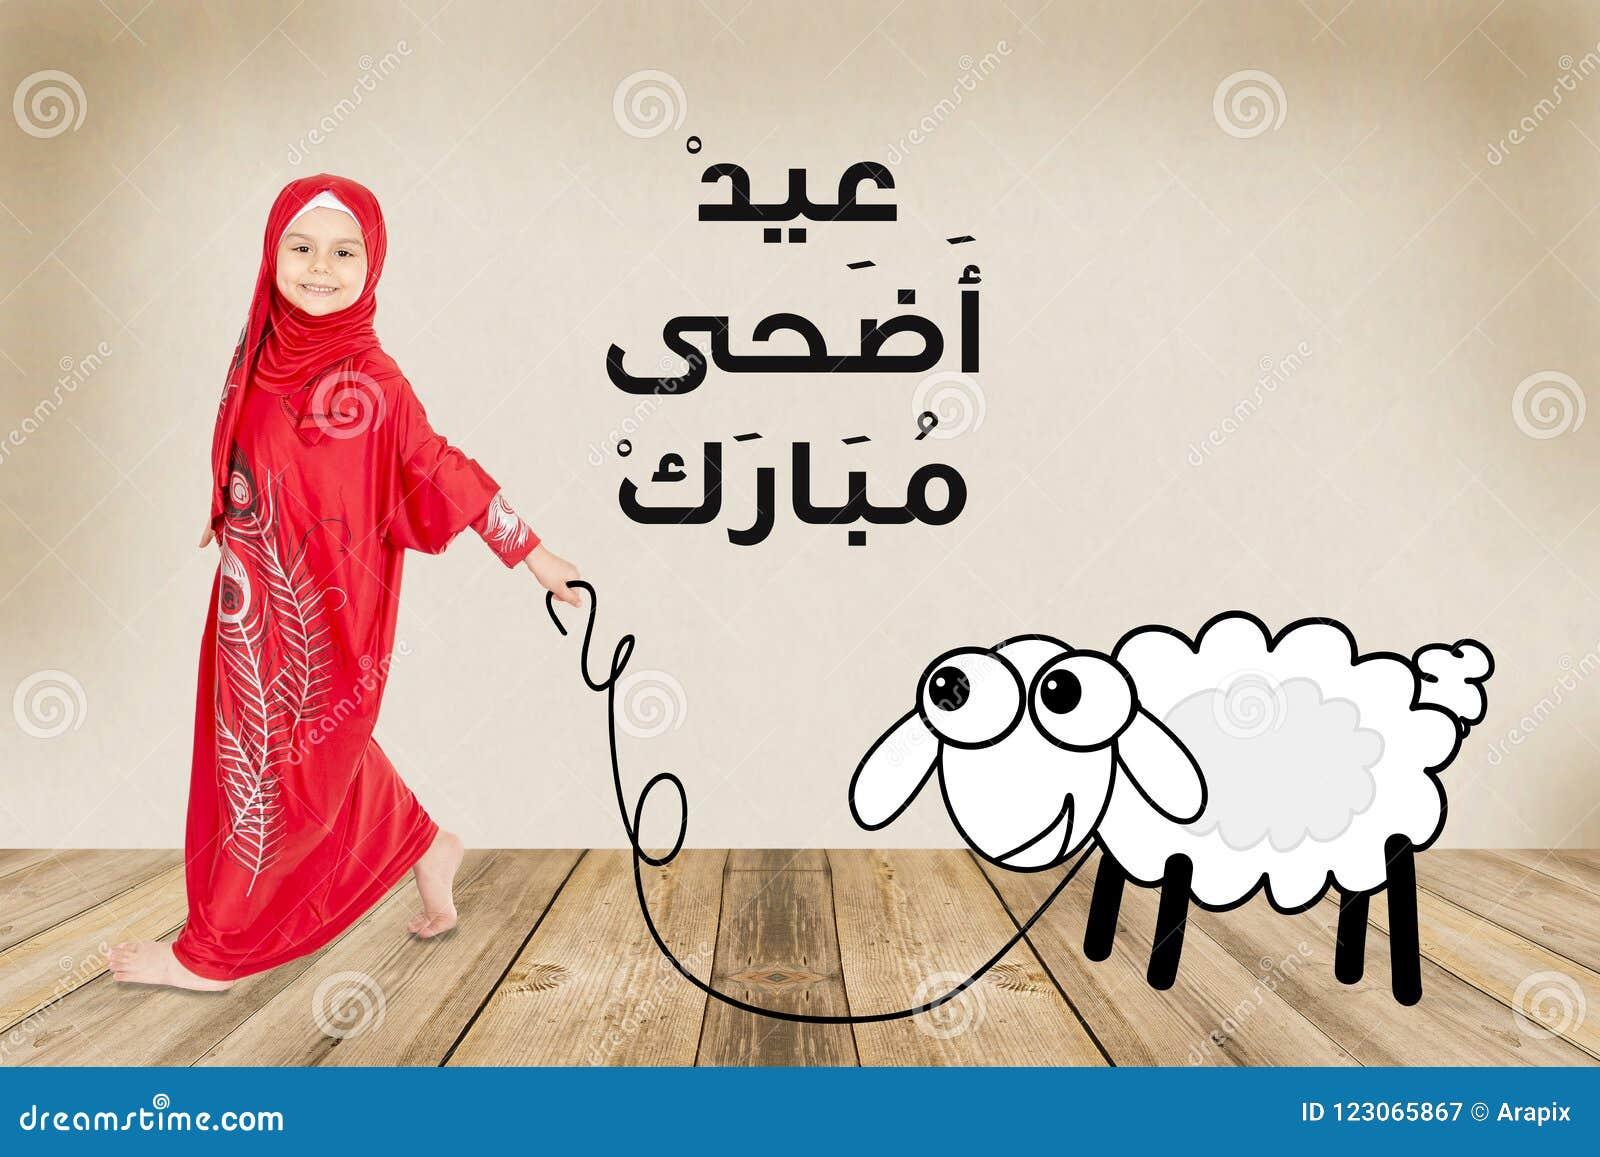 Greeting card eid adha mubarak stock image image of islam card arabic greeting card eid adha mubarak happy sacrifice feast m4hsunfo